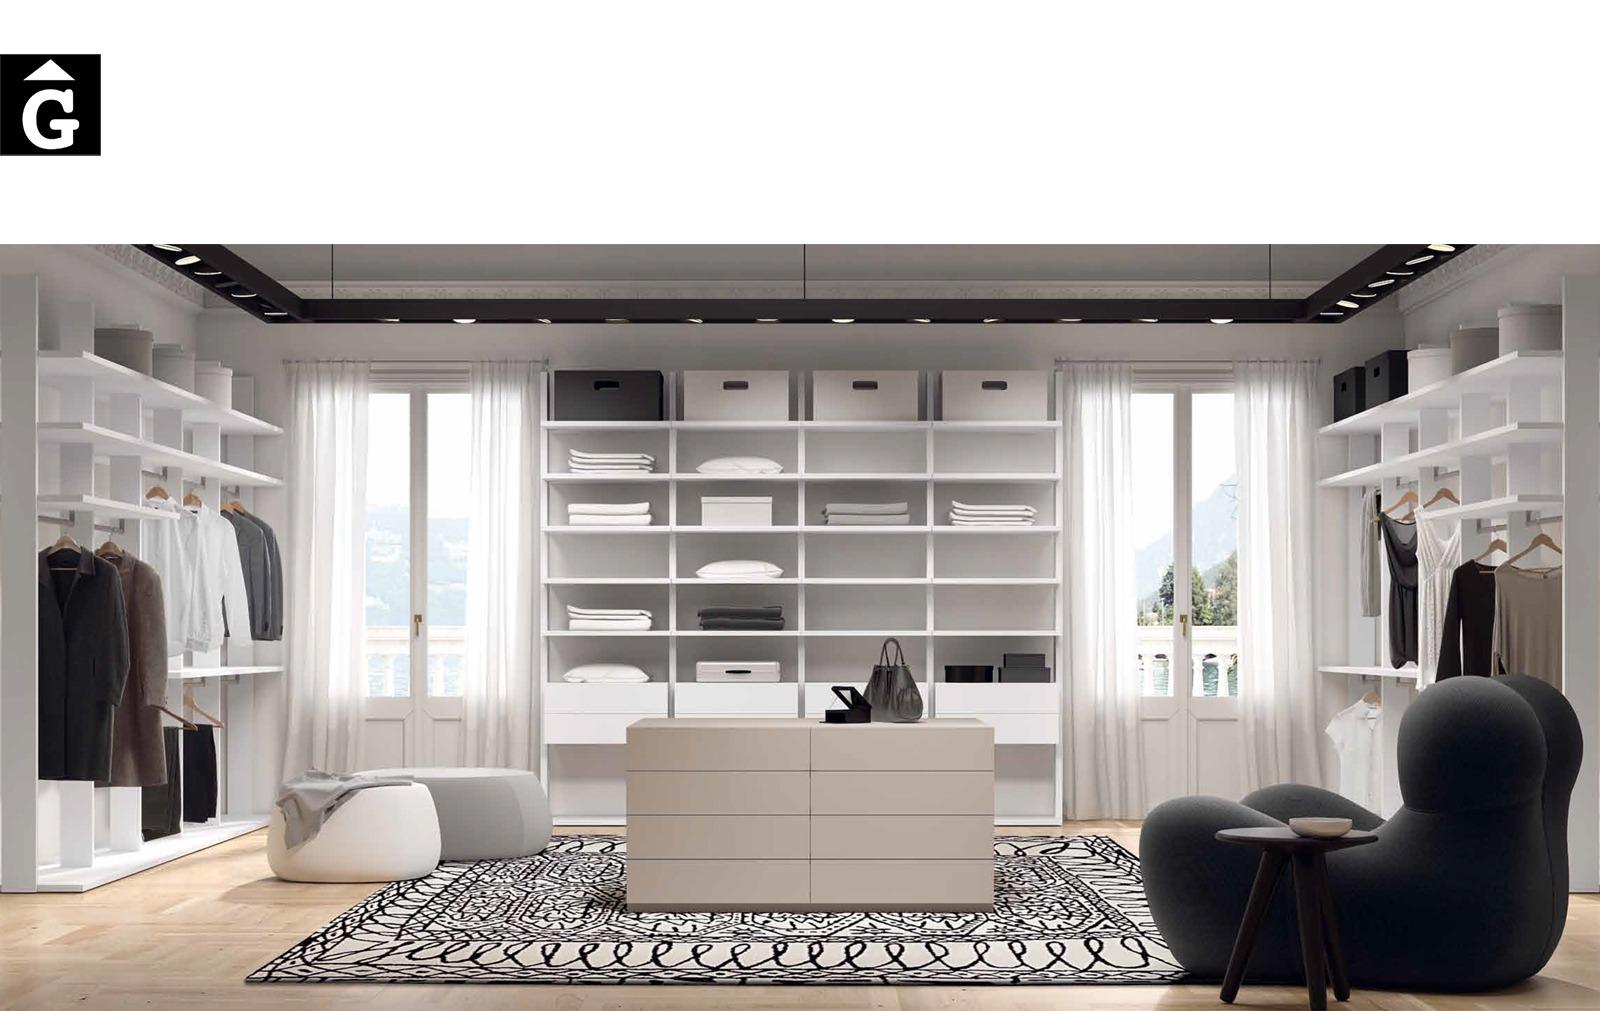 Vestidor exclusiu Besform by Mobles GIFREU Armaris Vestidors Habitcions a mida modern minim elegant atemporal